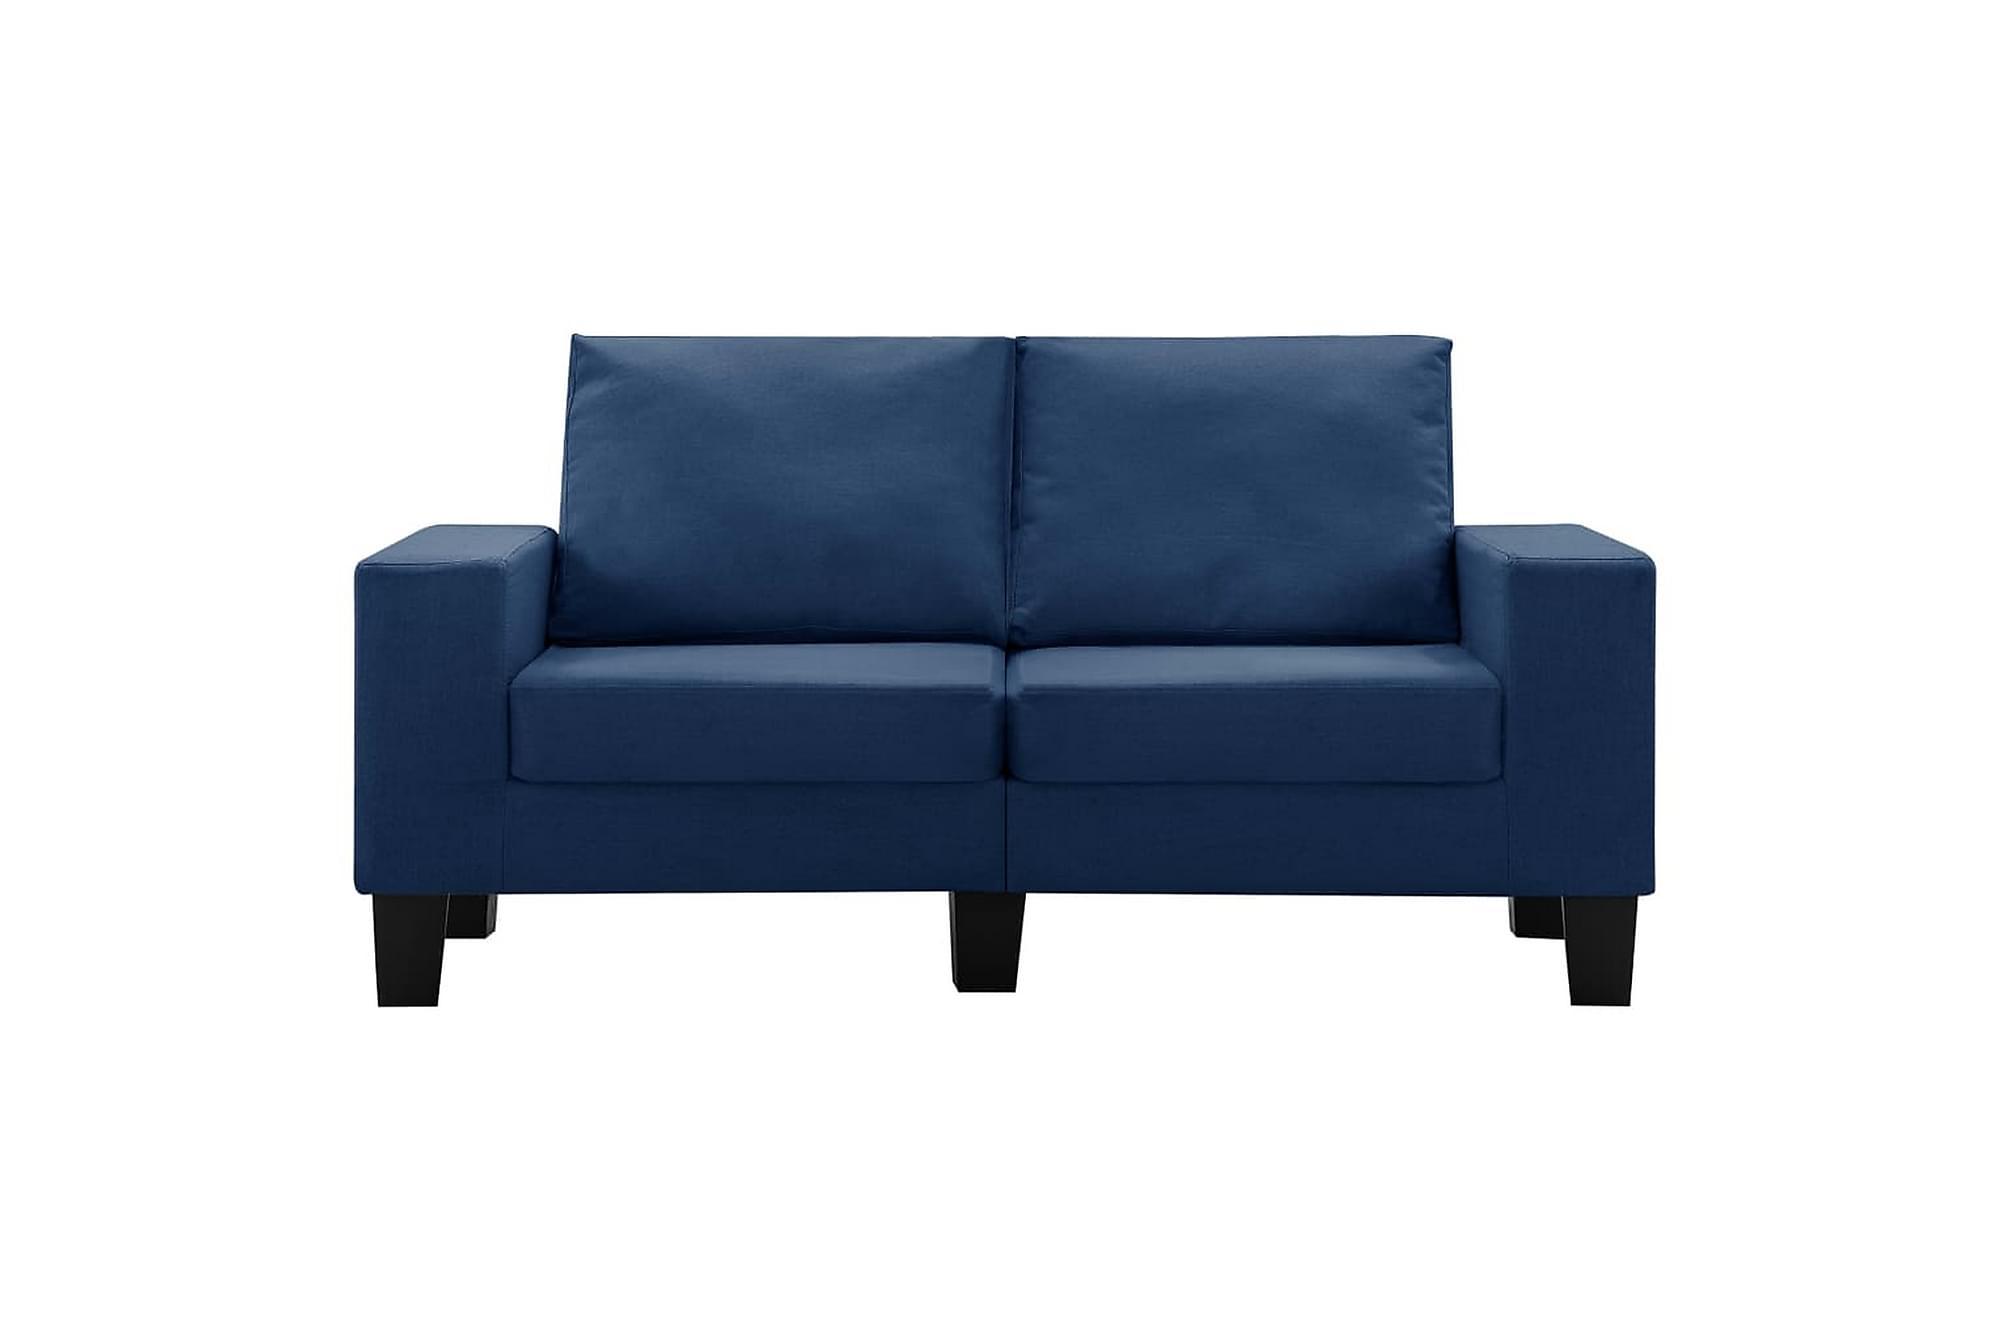 2-sitssoffa blå tyg, Soffor